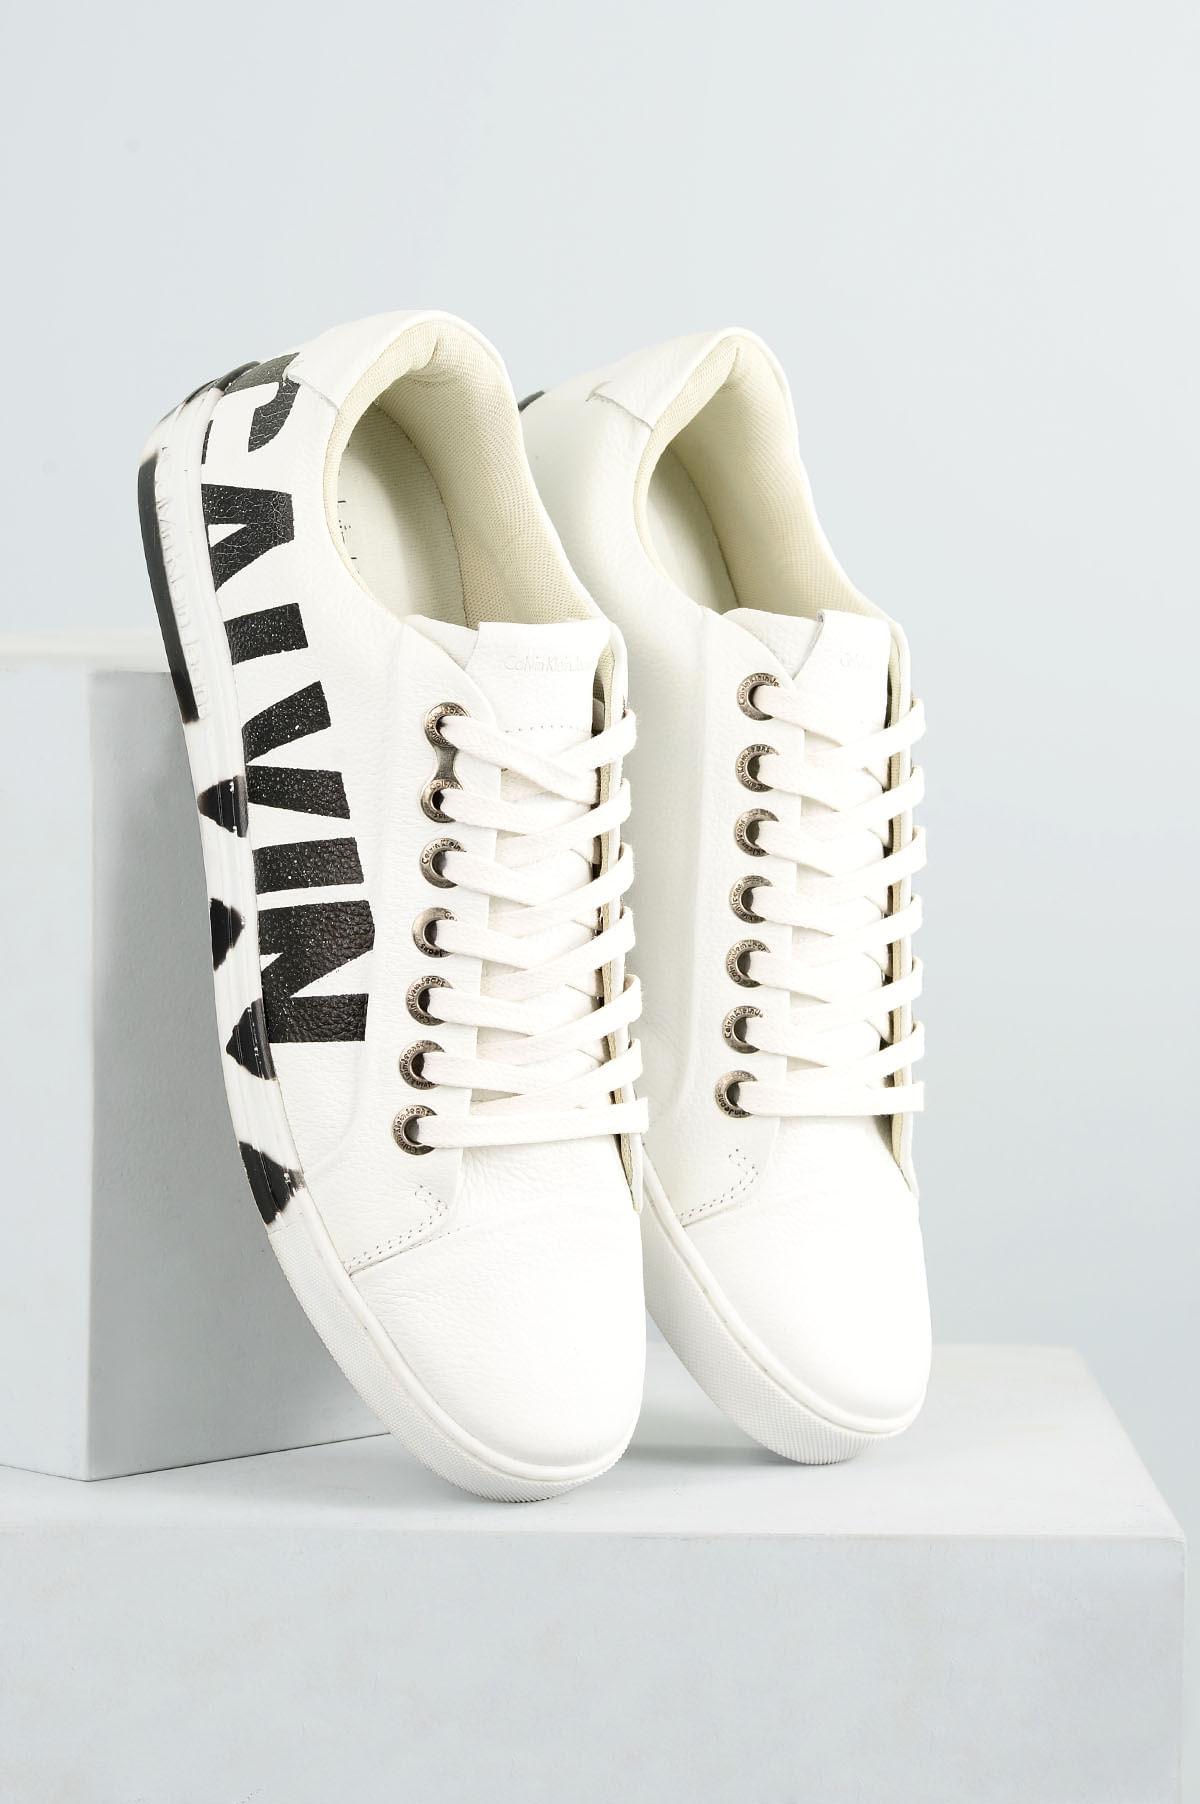 389ae9e2183 Sapatênis Masculino Calvin Klein Pedro CR-BRANCO - Mundial Calçados